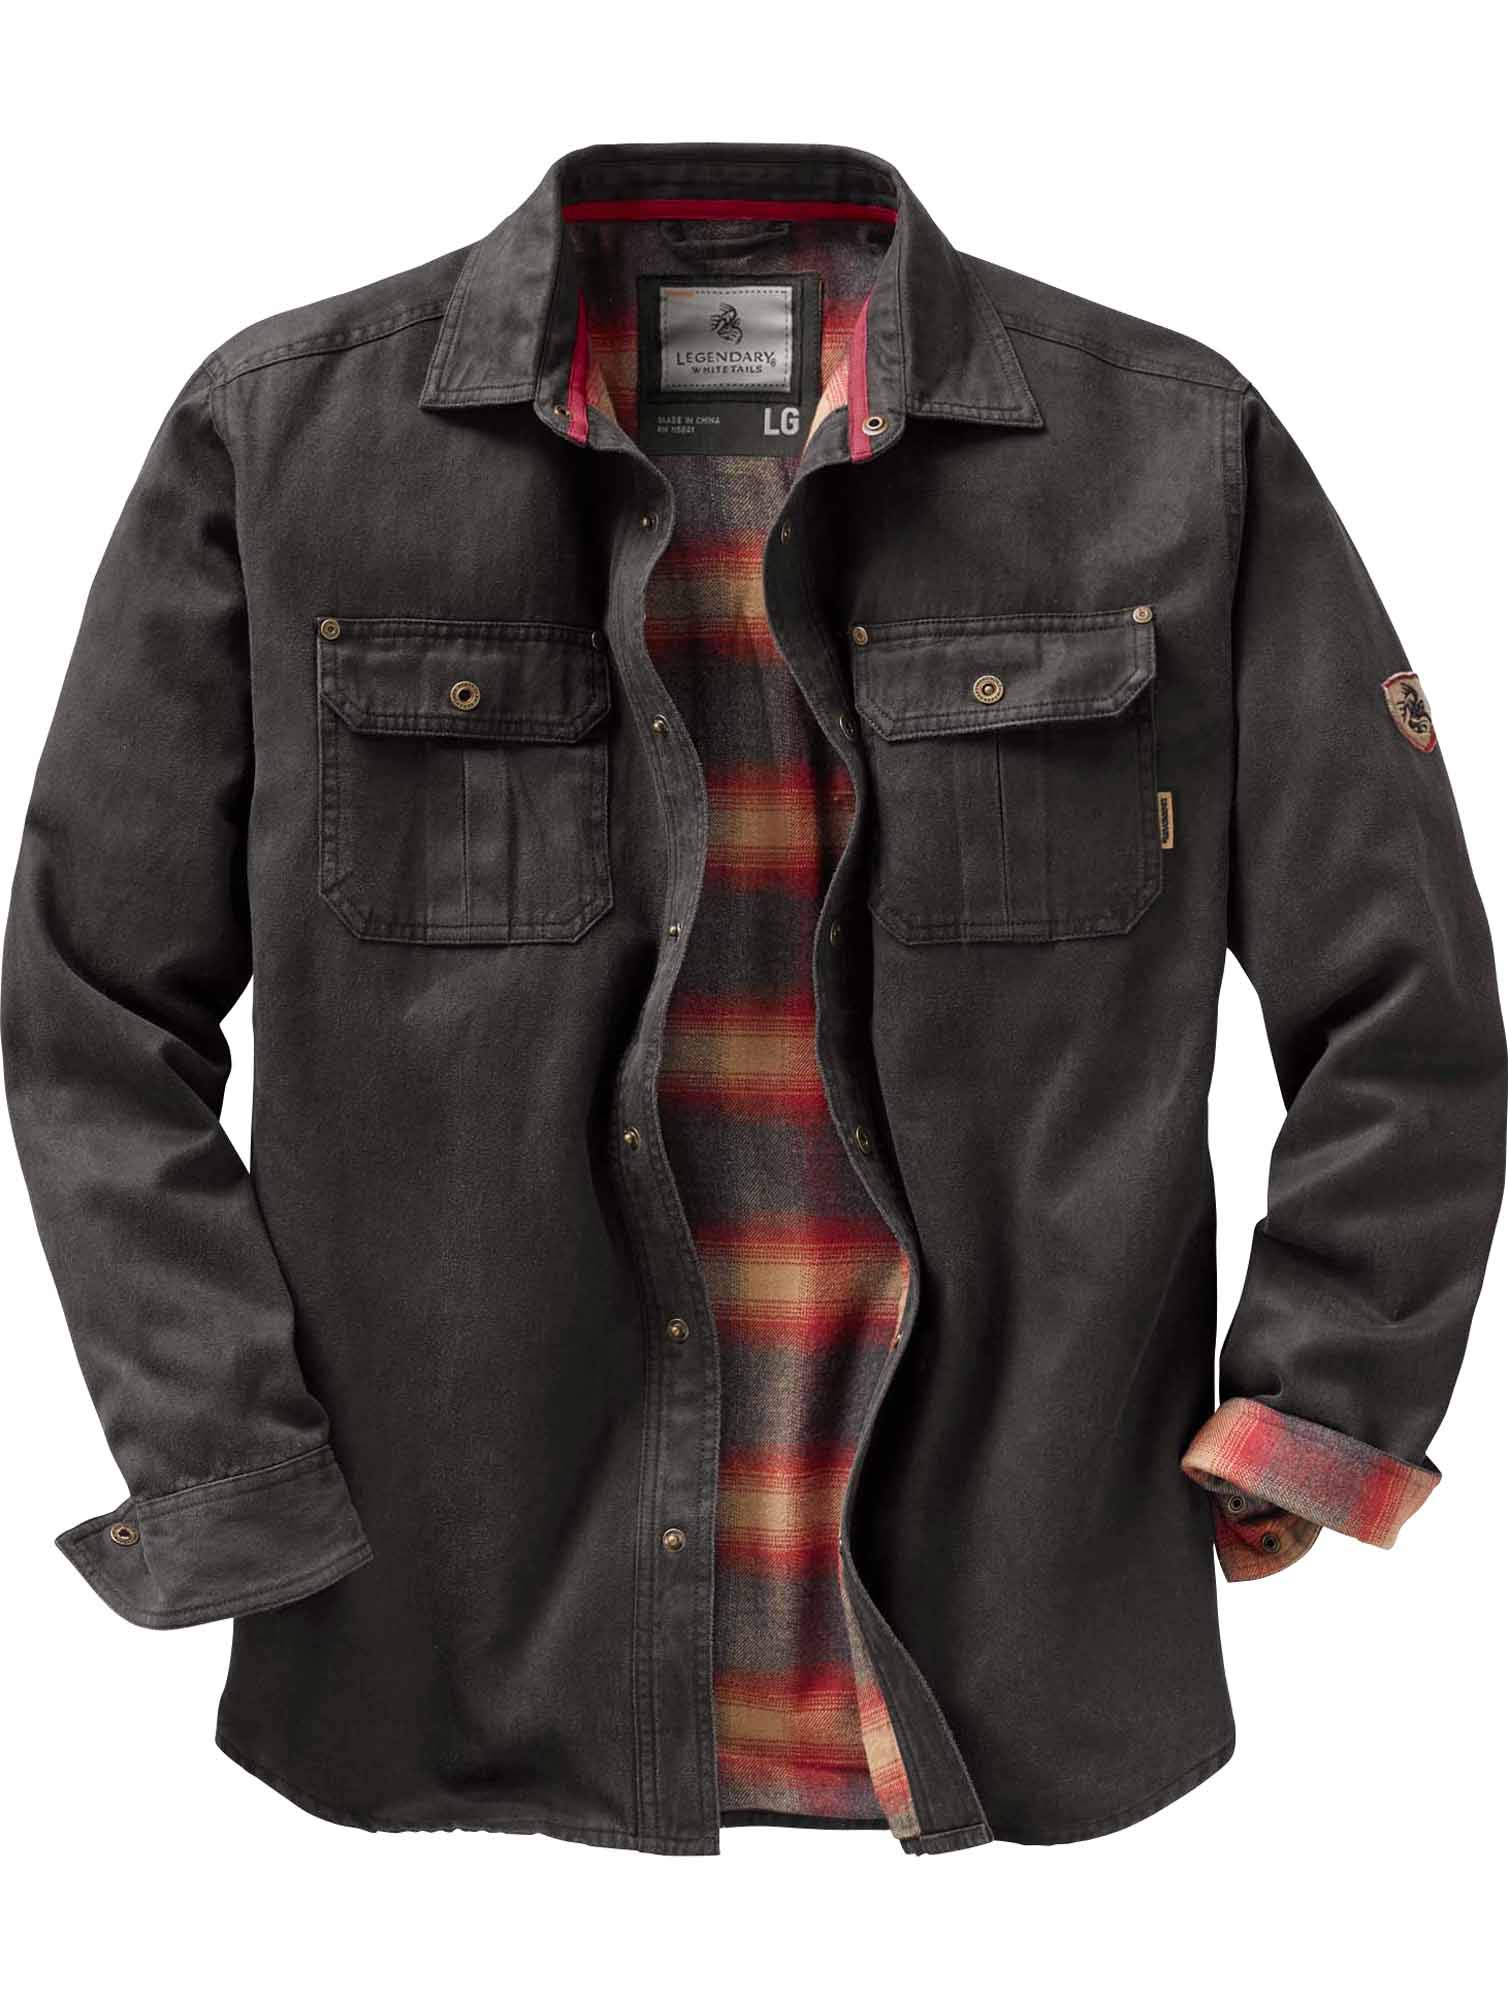 Legendary Whitetails Men's Journeyman Flannel Lined Rugged ...